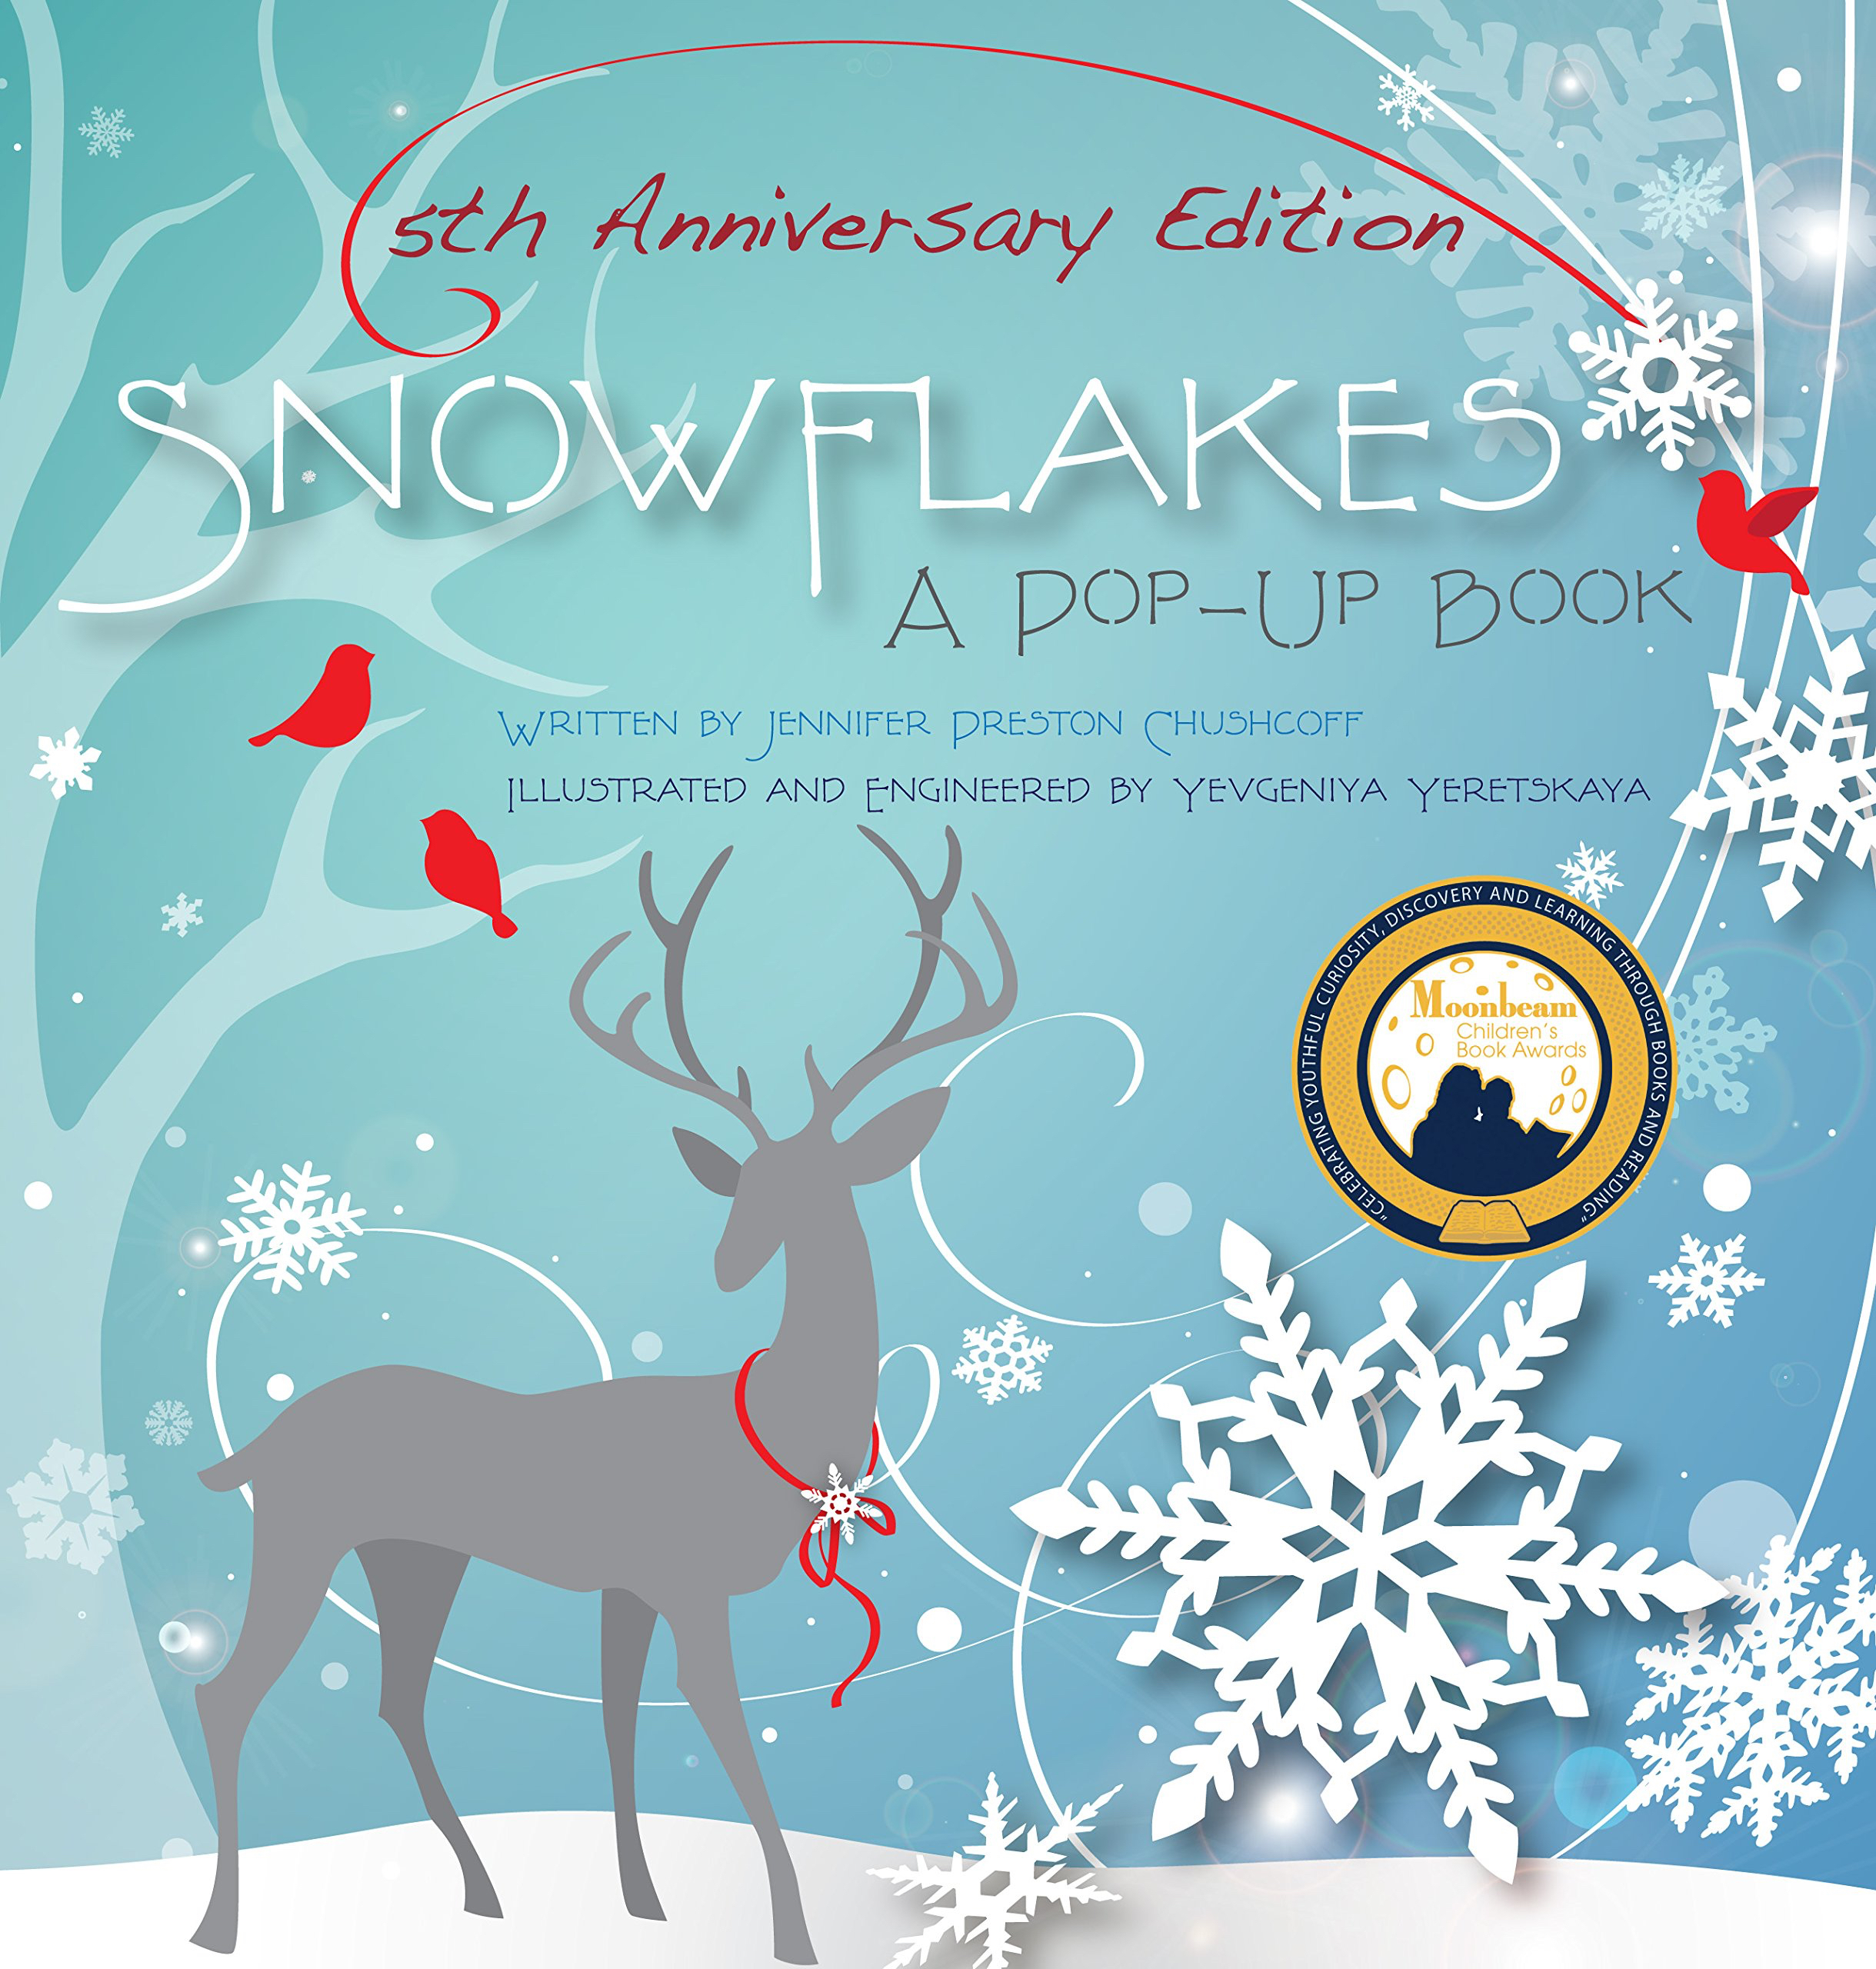 Snowflakes A Pop up book by local author, Jennifer Preston Chushcoff